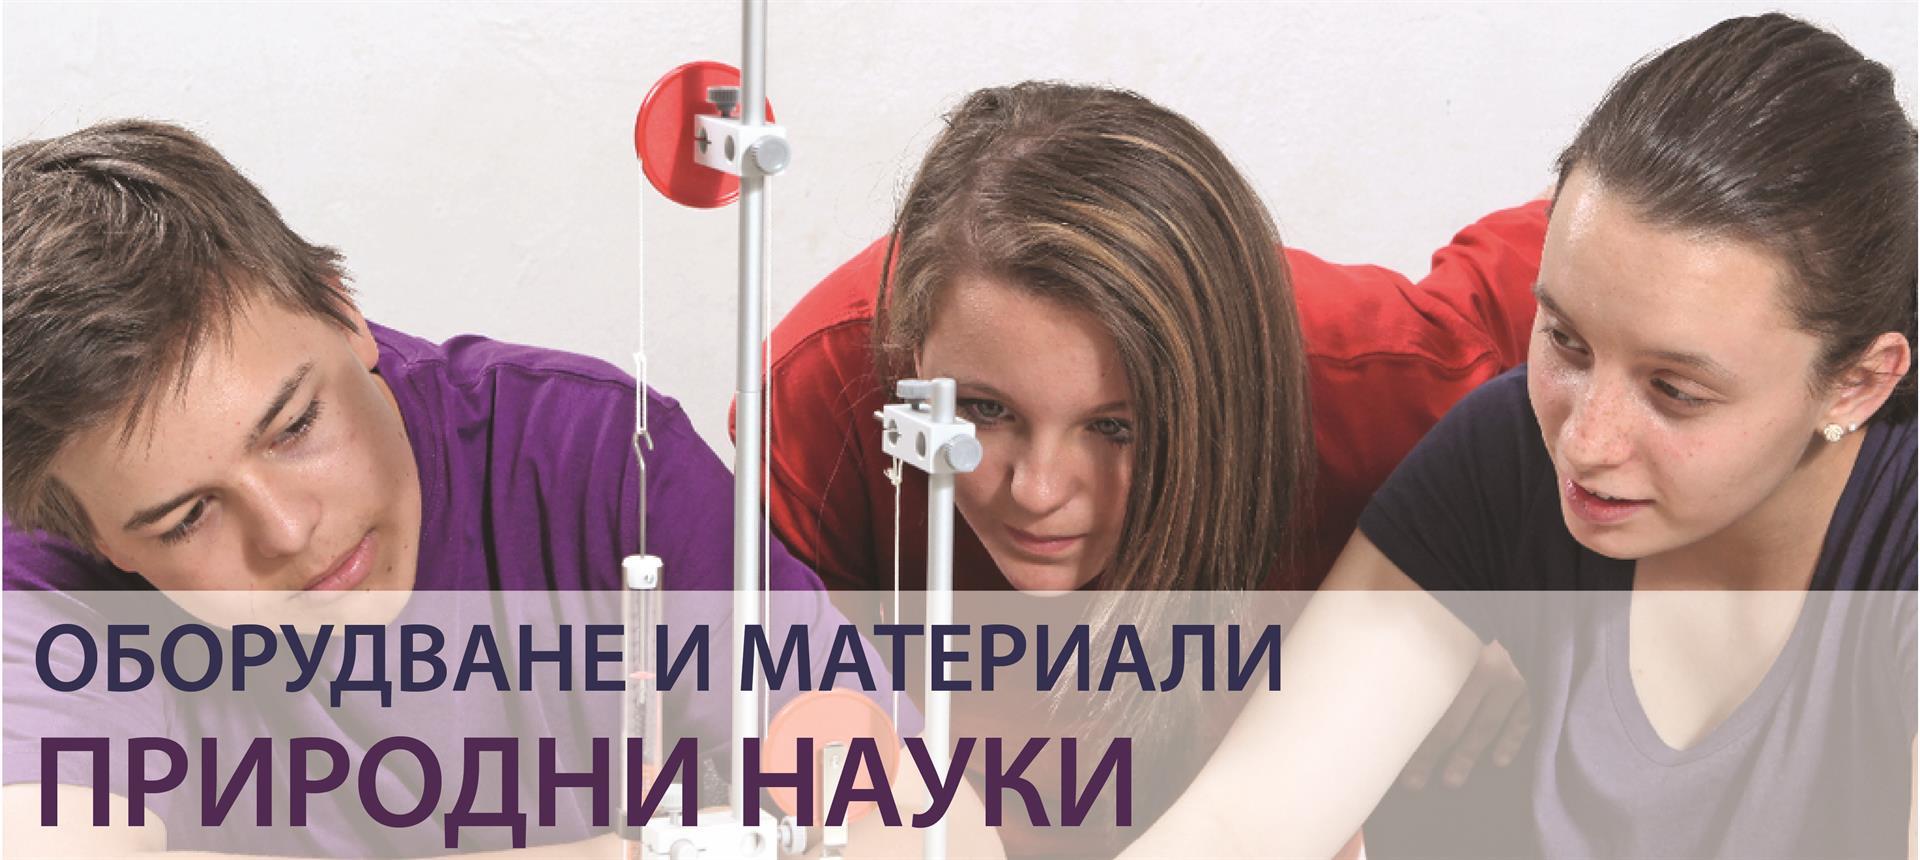 banner_prirodni-01.jpg